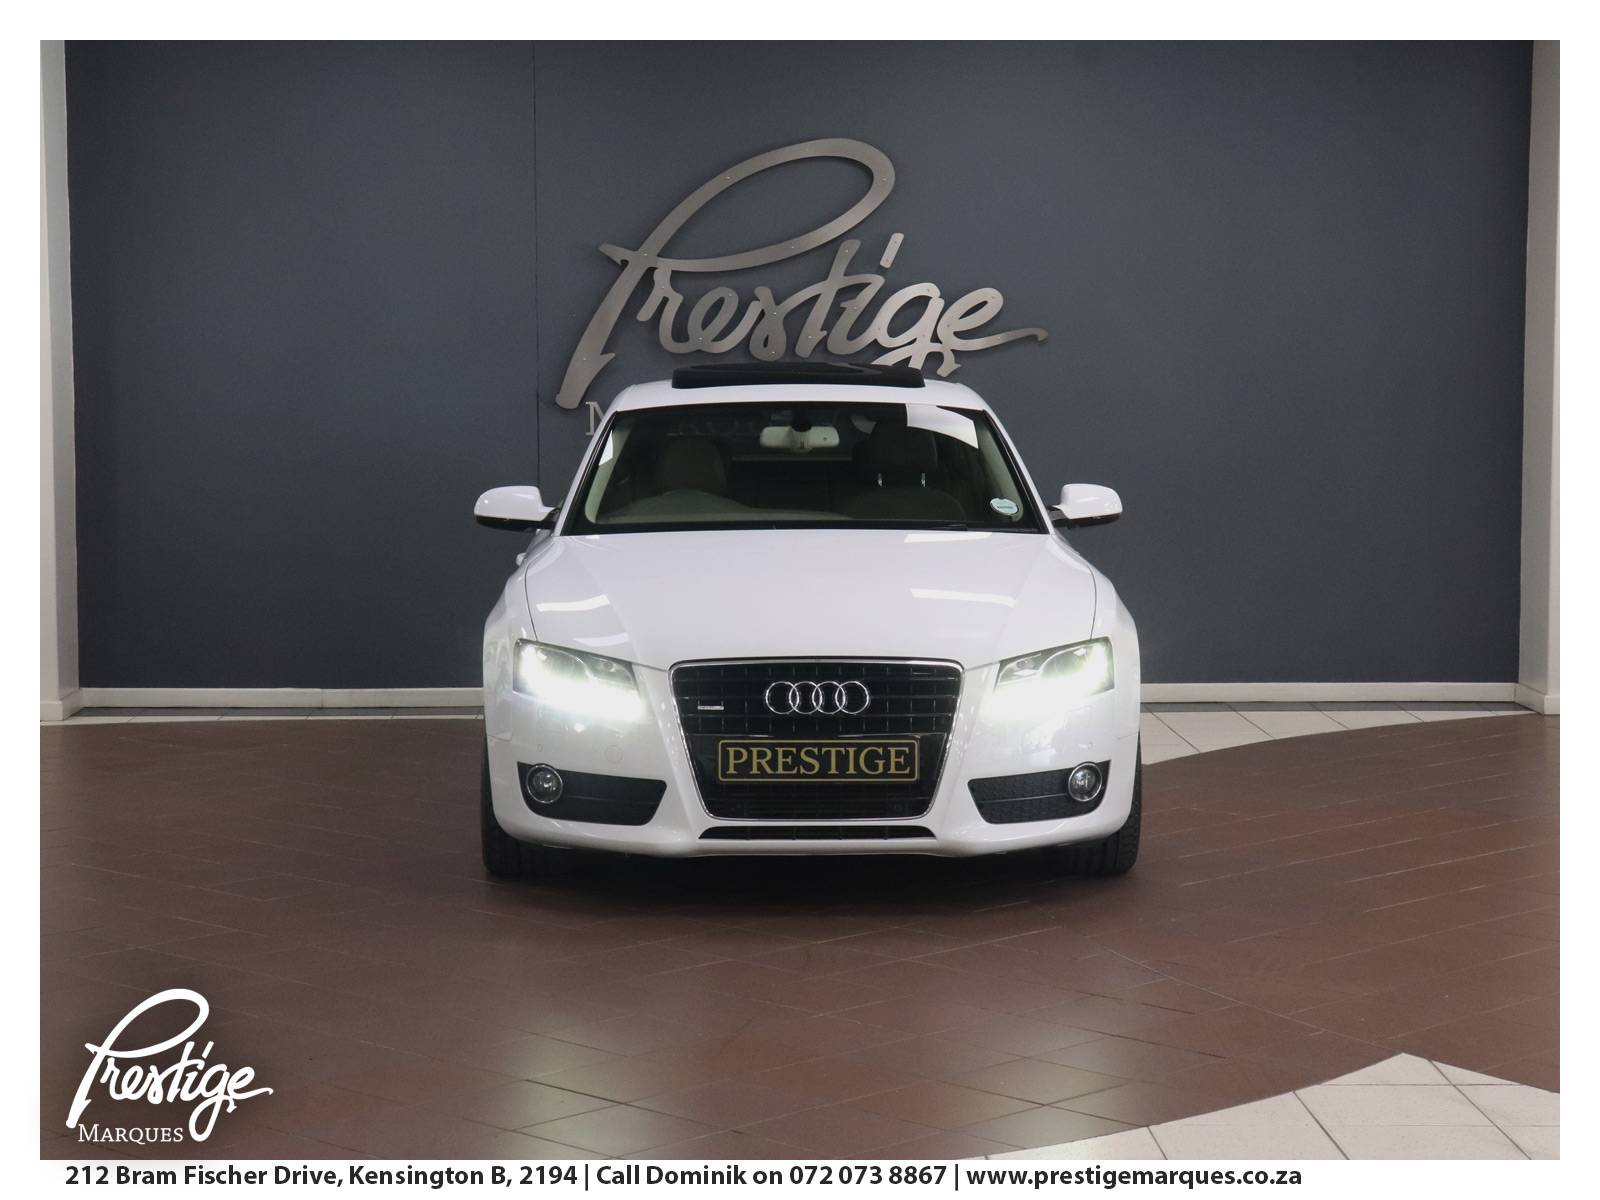 2011-Audi-A5-3.0-TDI-Quattro-Stronic-Prestige-Marques-Randburg-Sandton-7